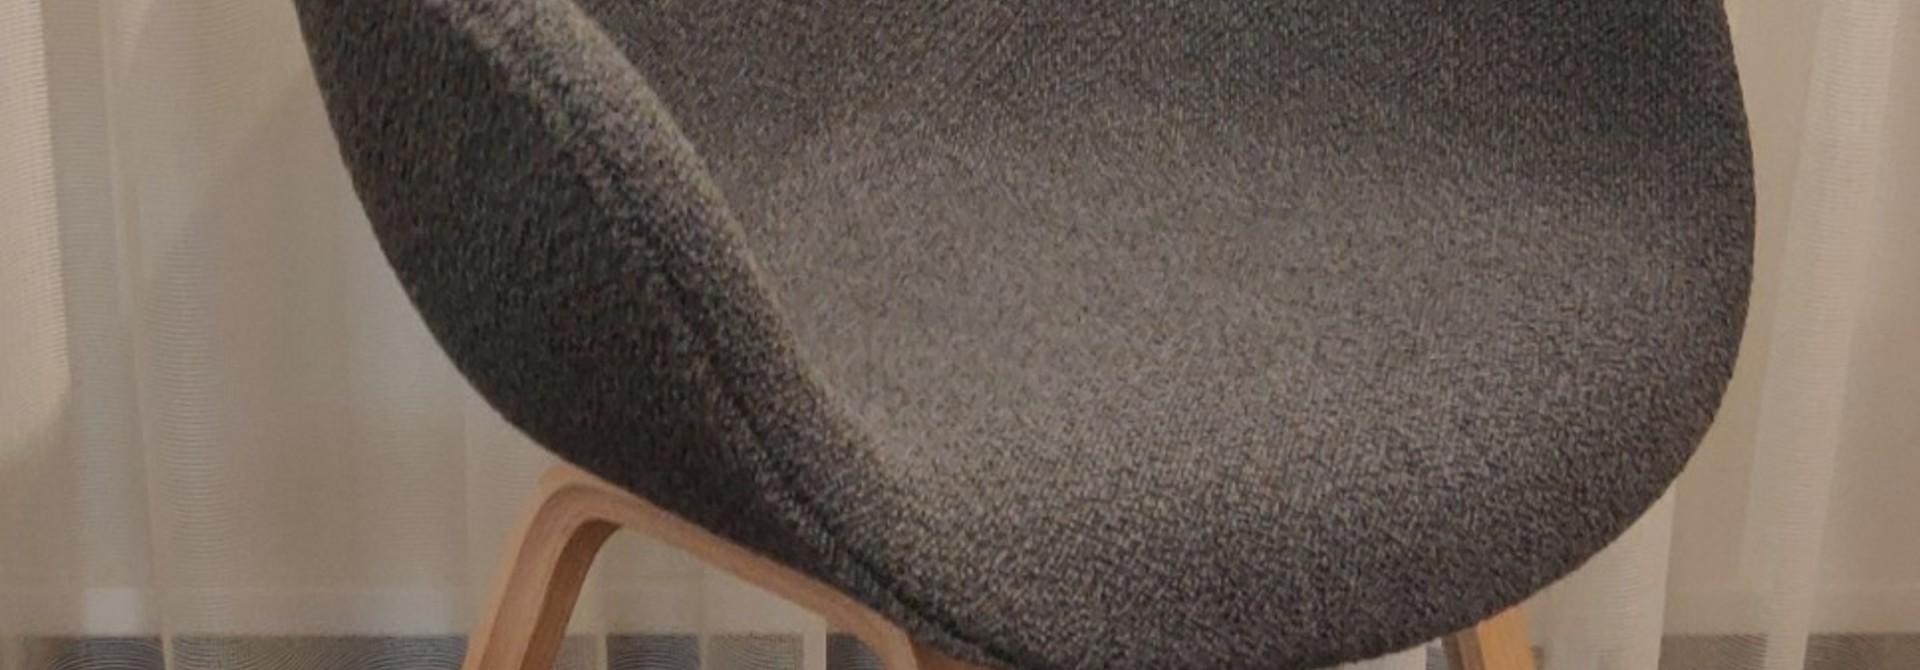 Toonzaalmodel AAC123 - Matt lacquered oak veneer base Flamiber Charcoal C8